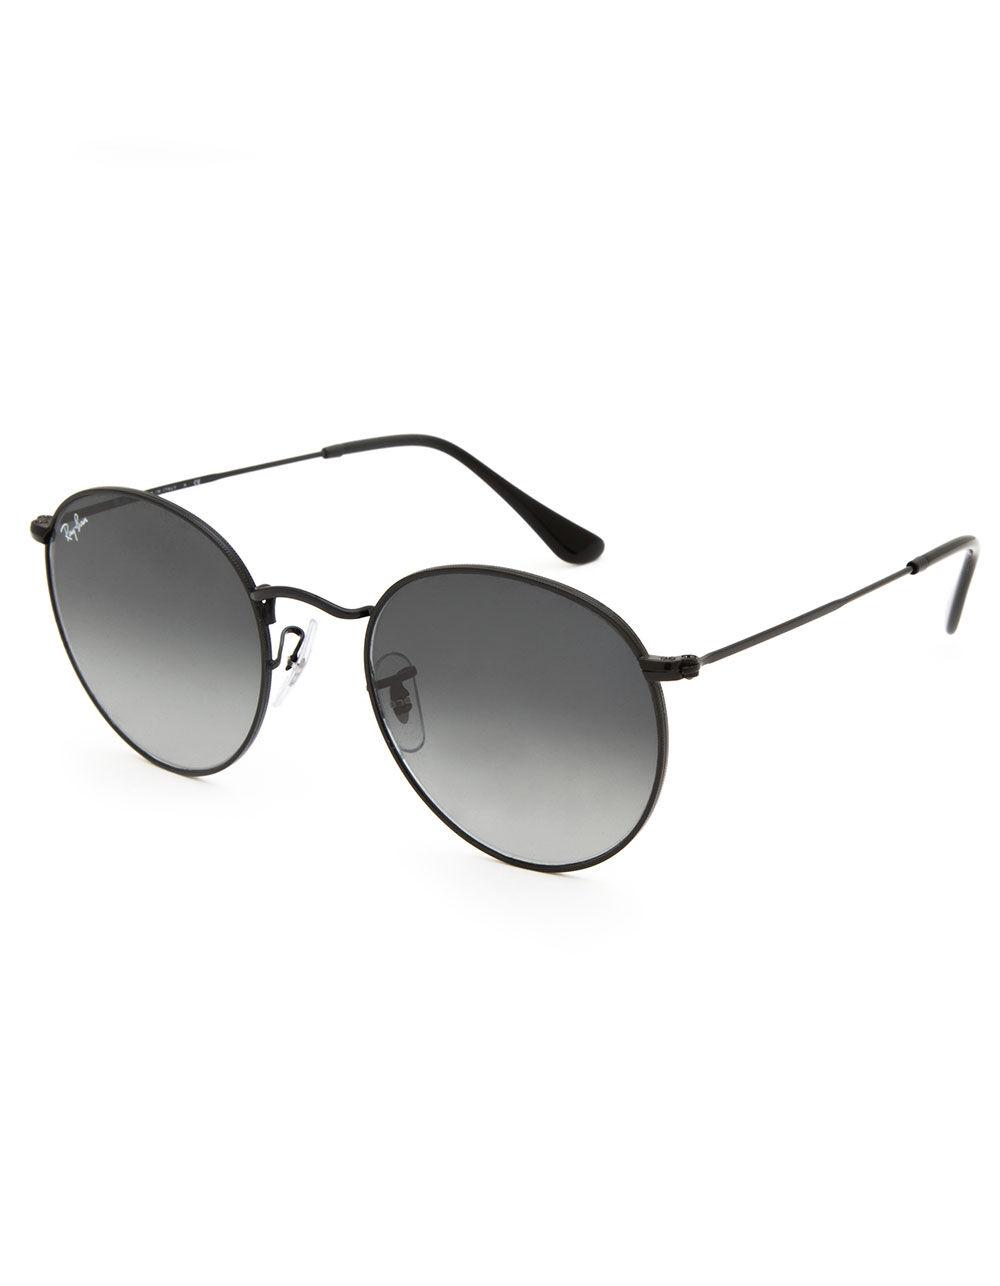 RAY-BAN Round Flat Lenses Grey Gradient & Black Sunglasses